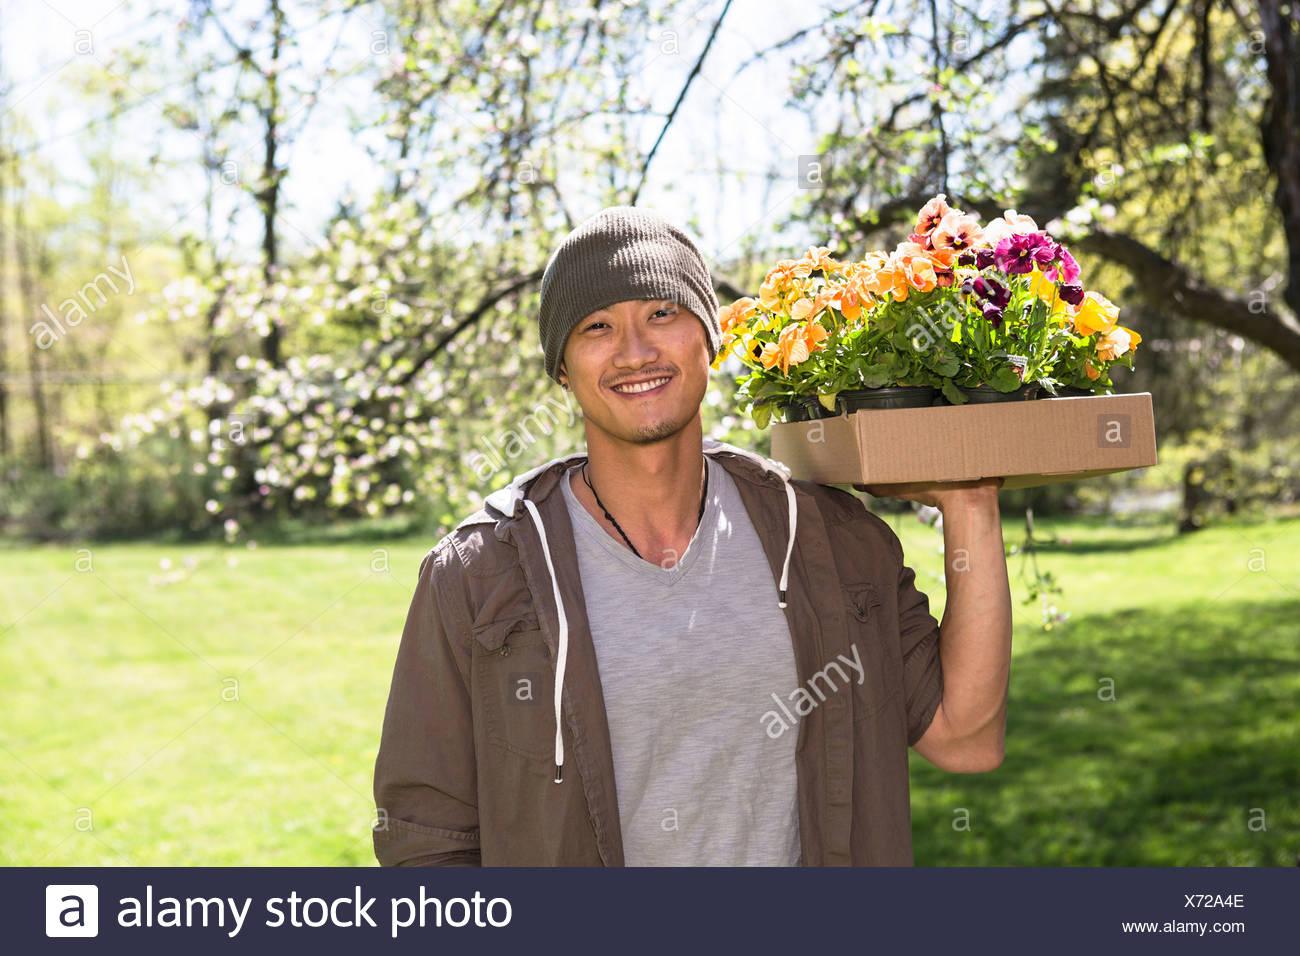 Man holding box of flowers - Stock Image